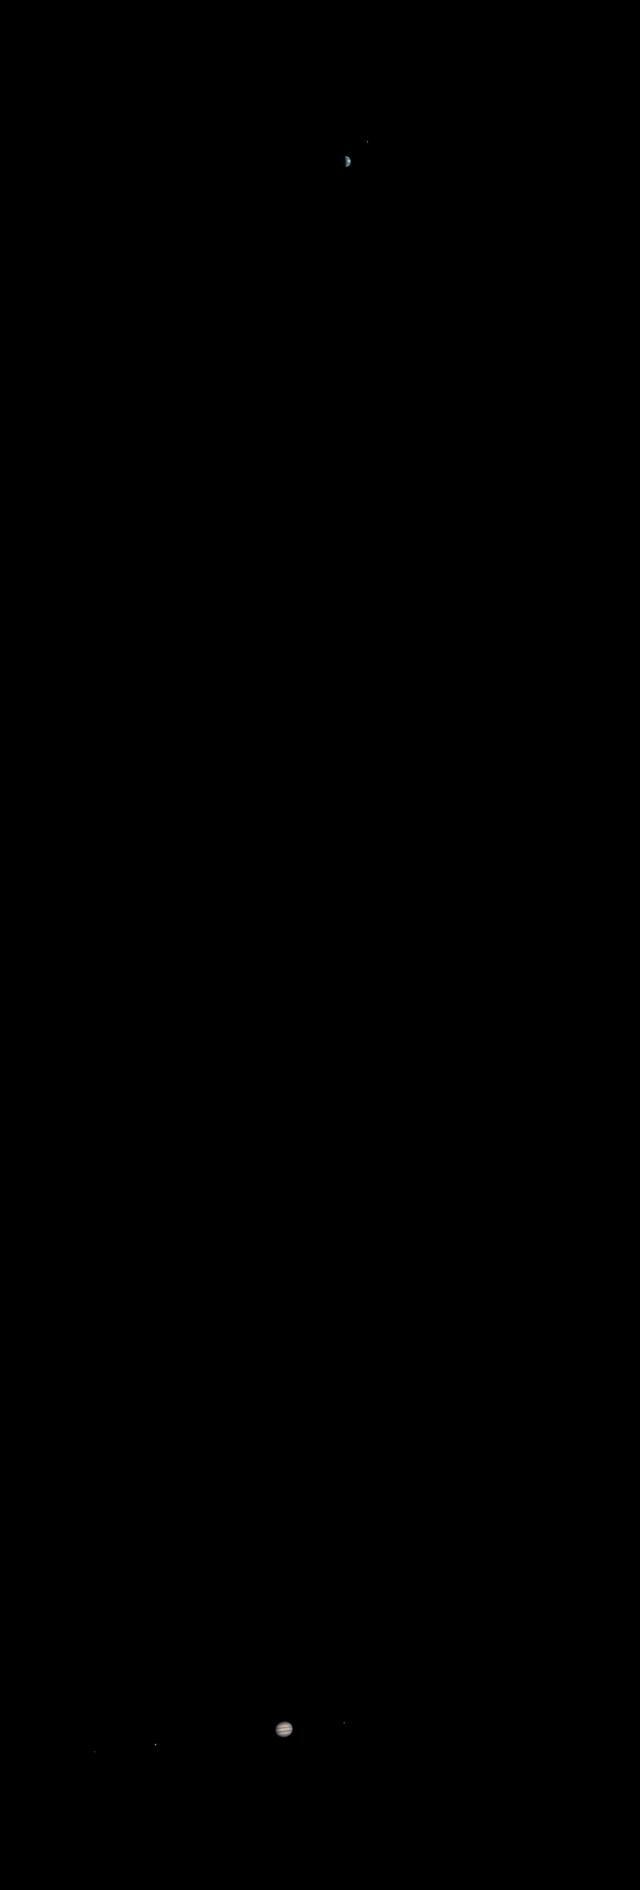 15-144a